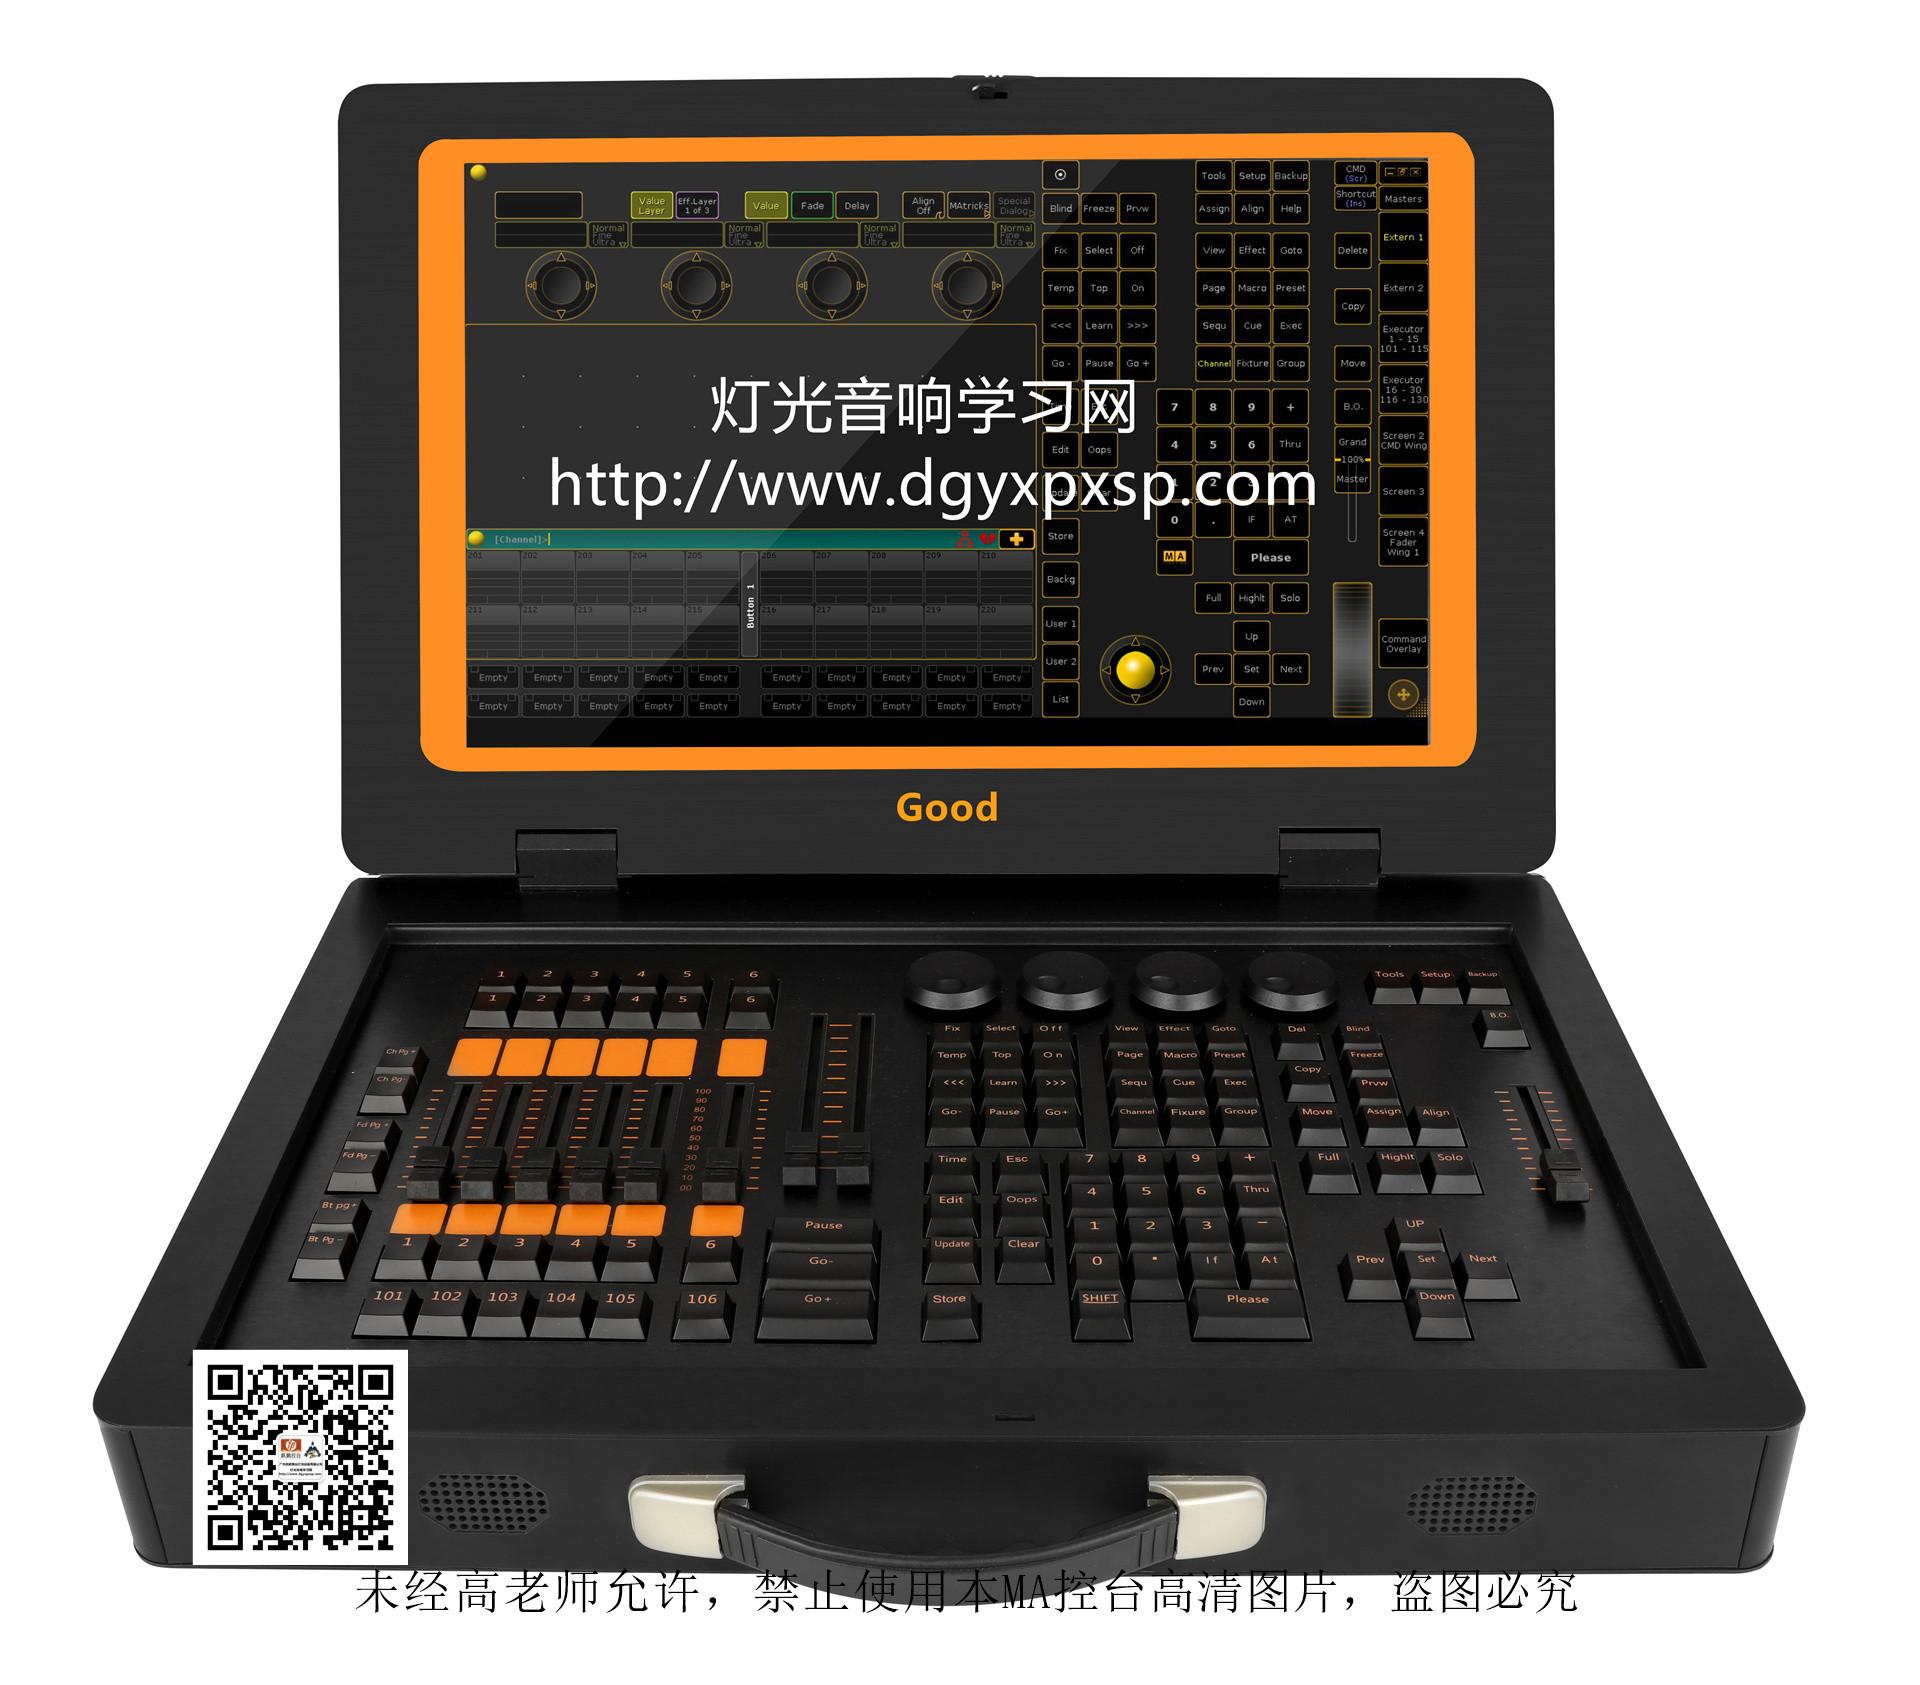 MA2便携式GOOD触摸19寸控台火热发售